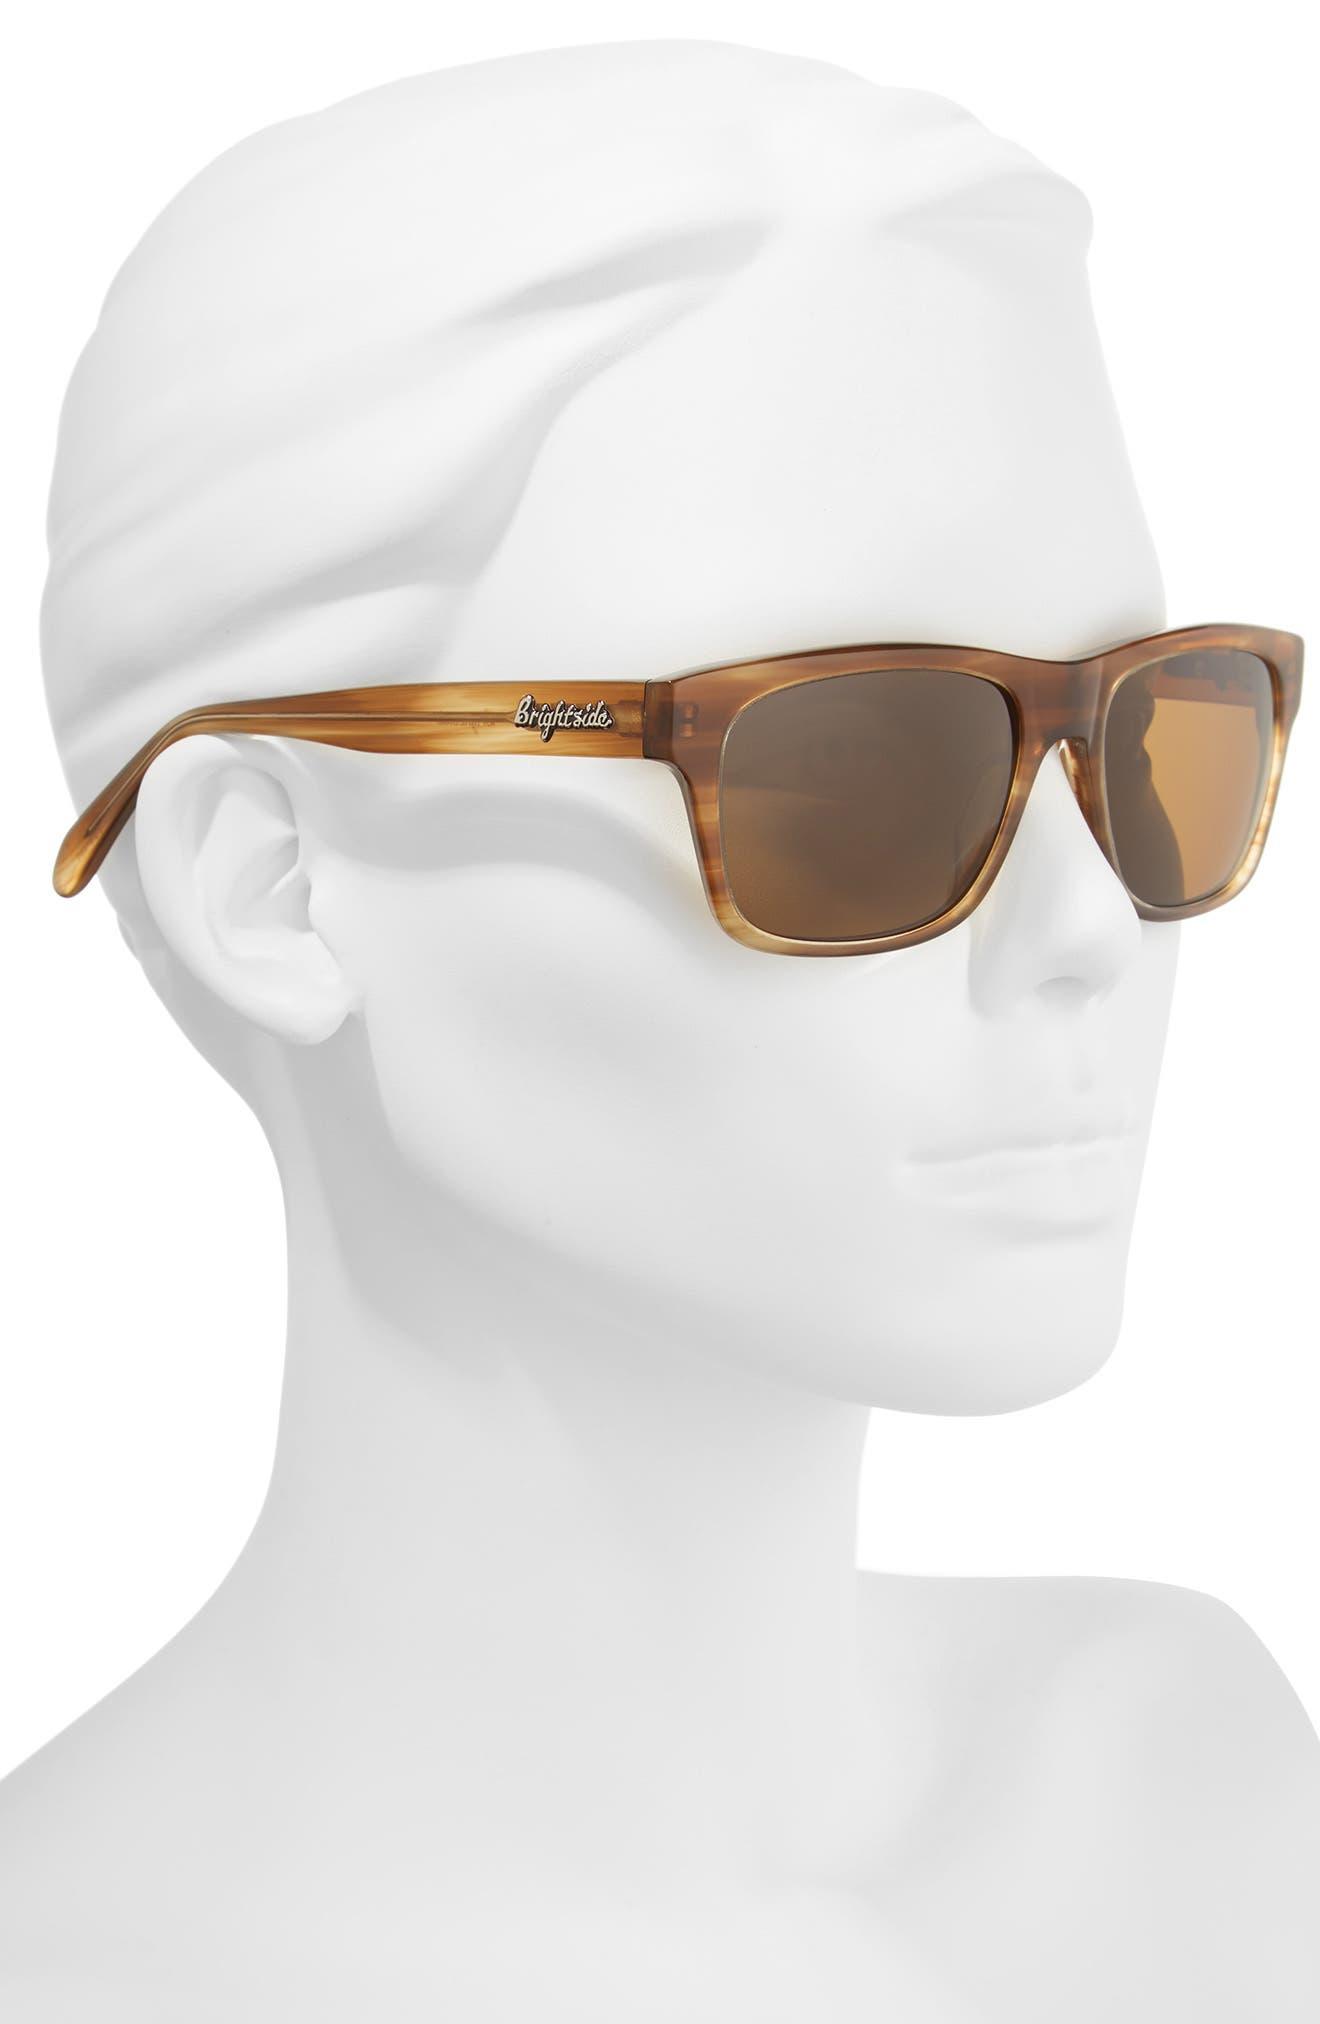 Wilshire 55mm Polarized Sunglasses,                             Alternate thumbnail 2, color,                             CEDAR/ BROWN POLAR